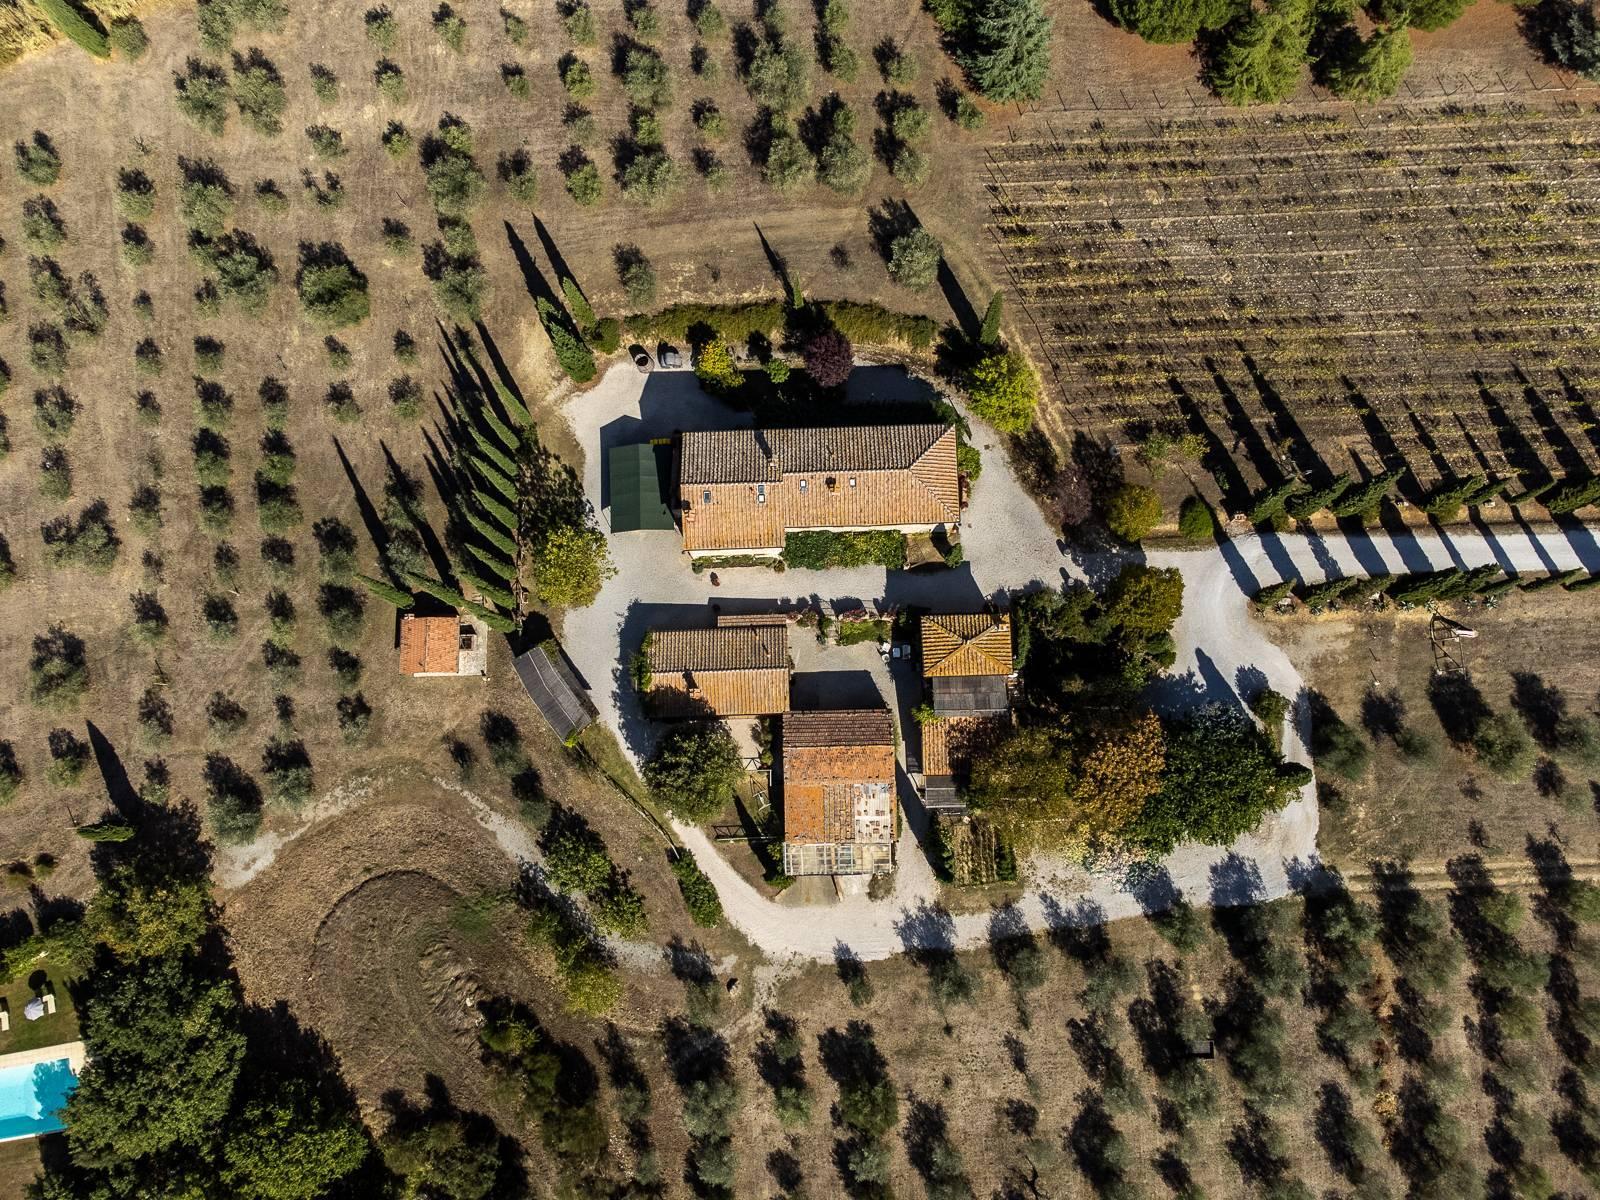 Organic winery in the heart of Crete Senesi - 1